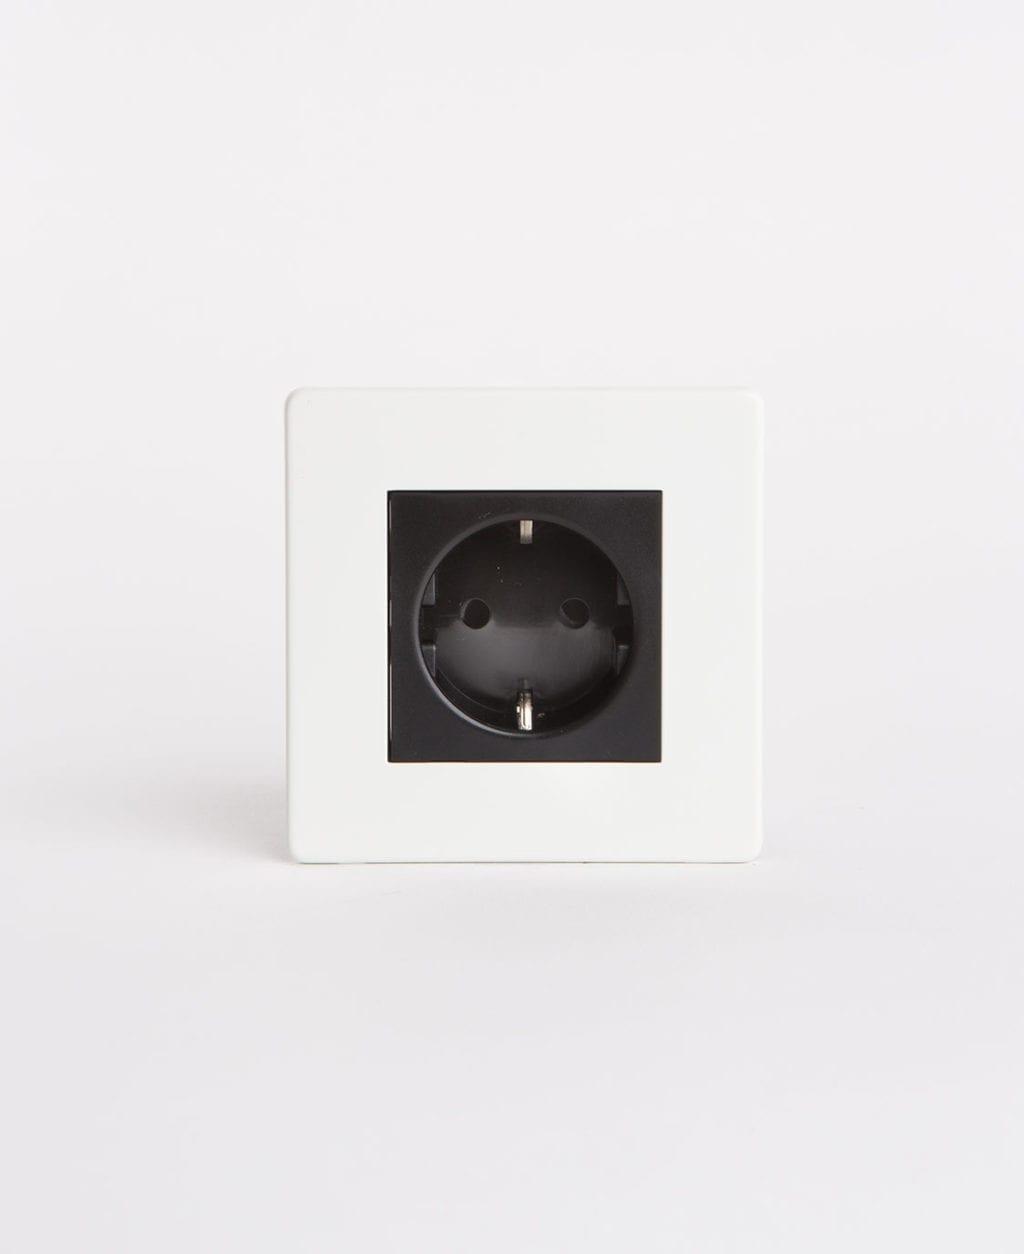 single white Schuko socet with black insert